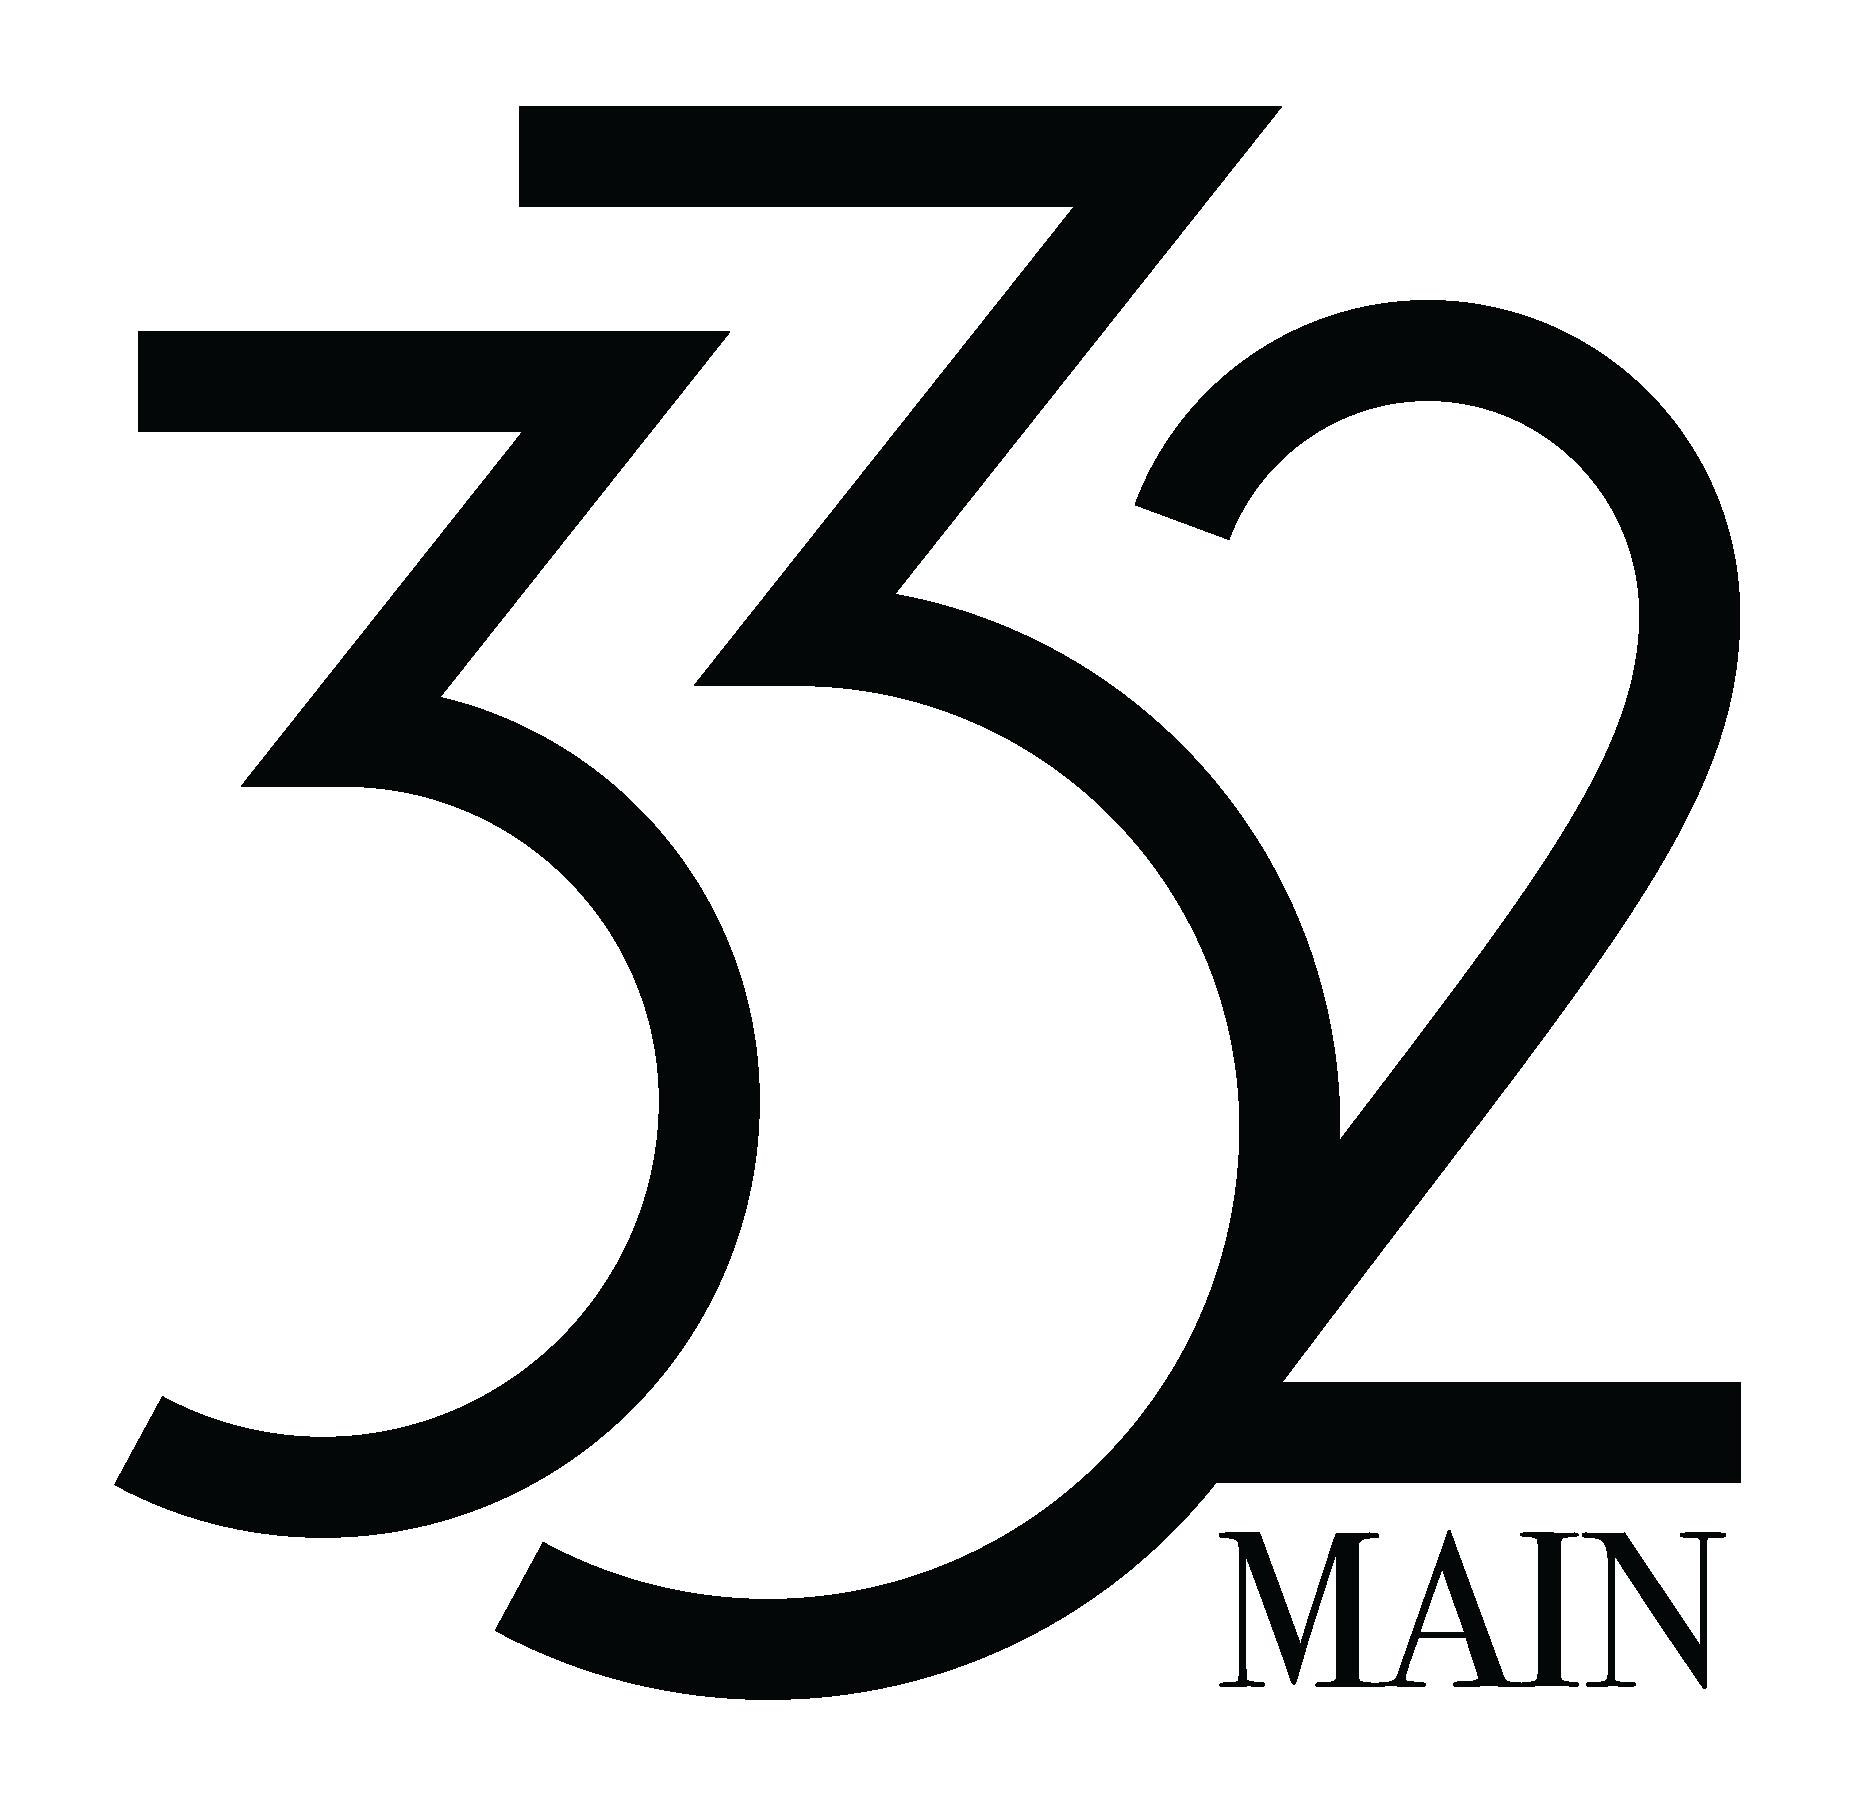 332Main